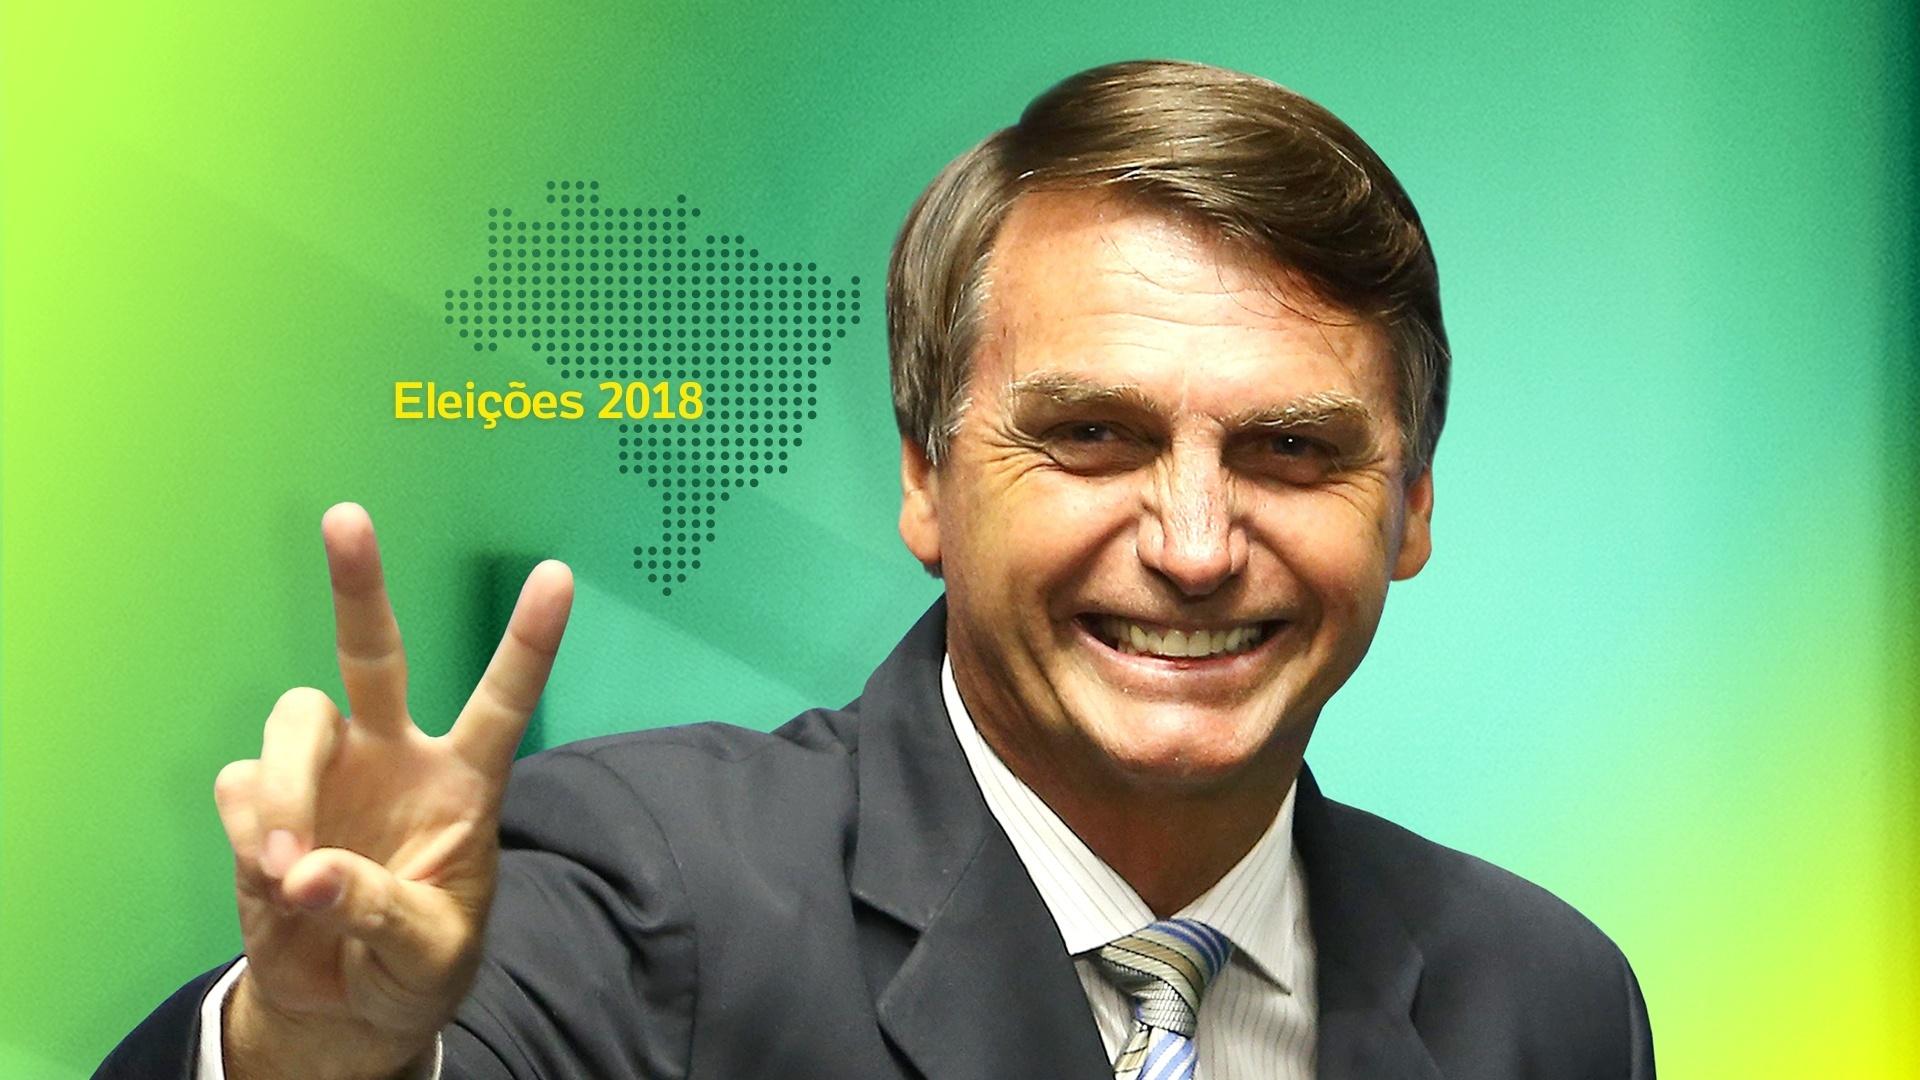 Jair Bolsonaro é eleito presidente do Brasil 2a000d1642c75